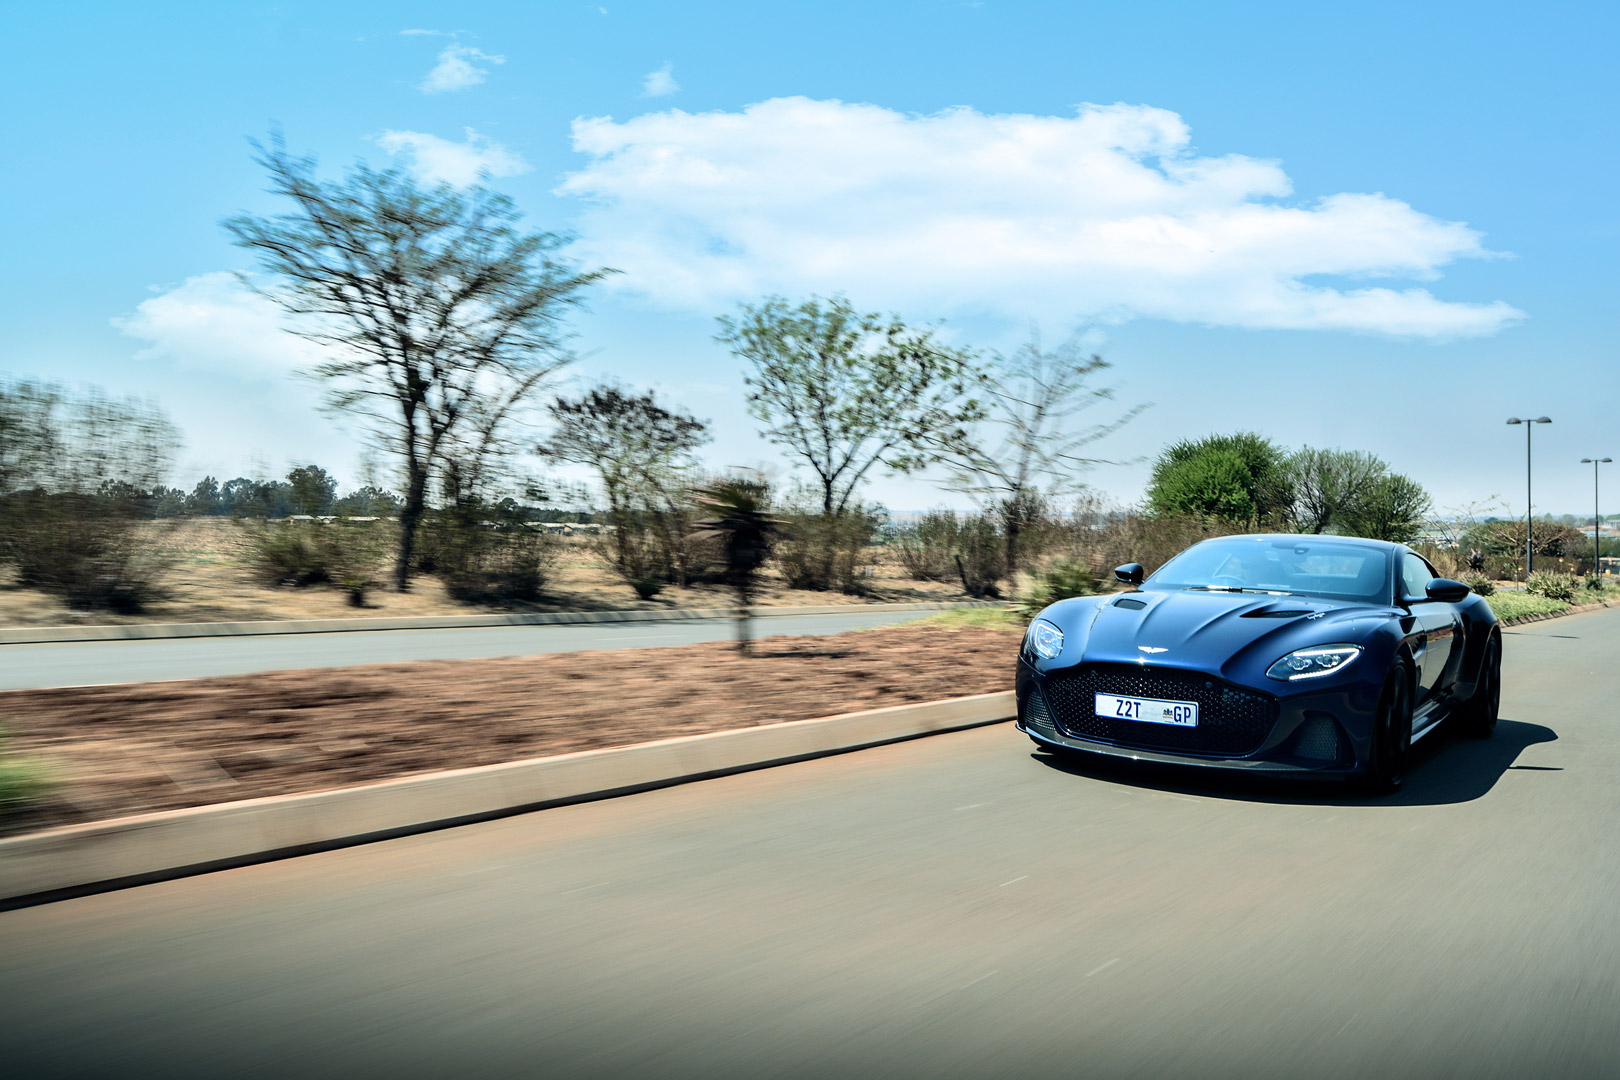 Aston Martin DBS Superleggera By Automotive Photographer Roland Woon Johannesburg South Africa